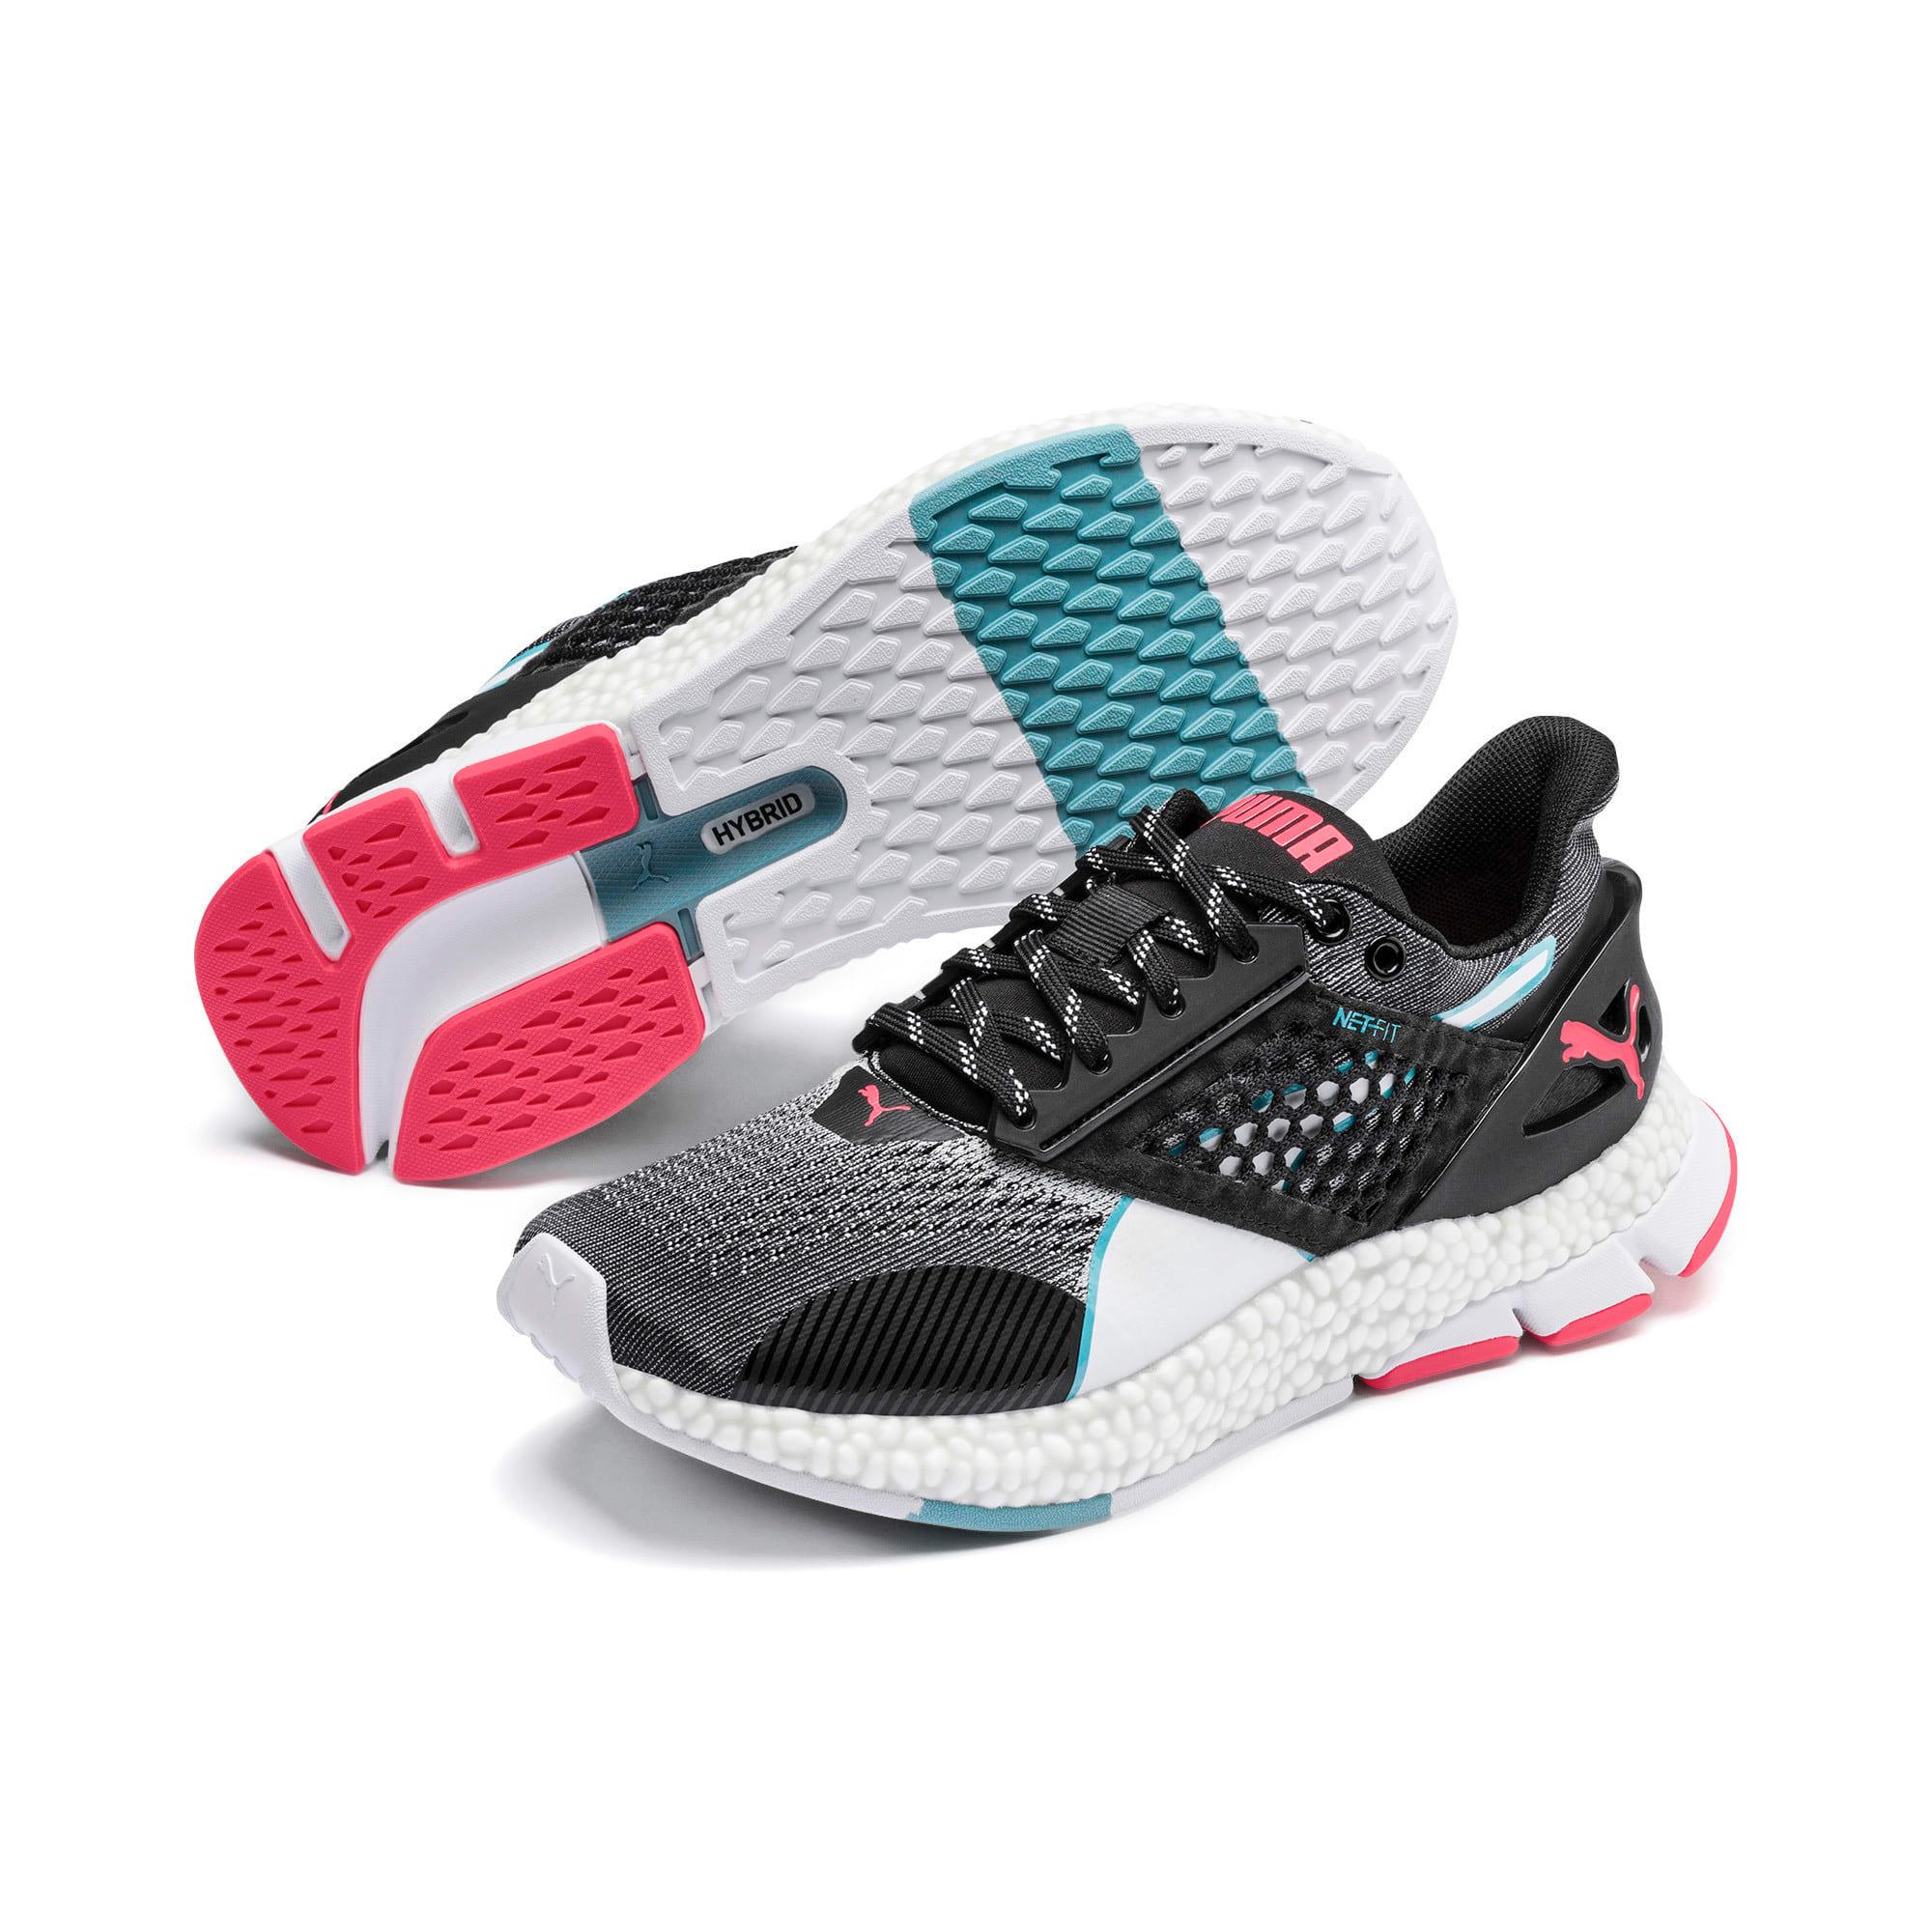 Thumbnail 3 of HYBRID Astro Women's Running Shoes, Puma Black-Pink Alert, medium